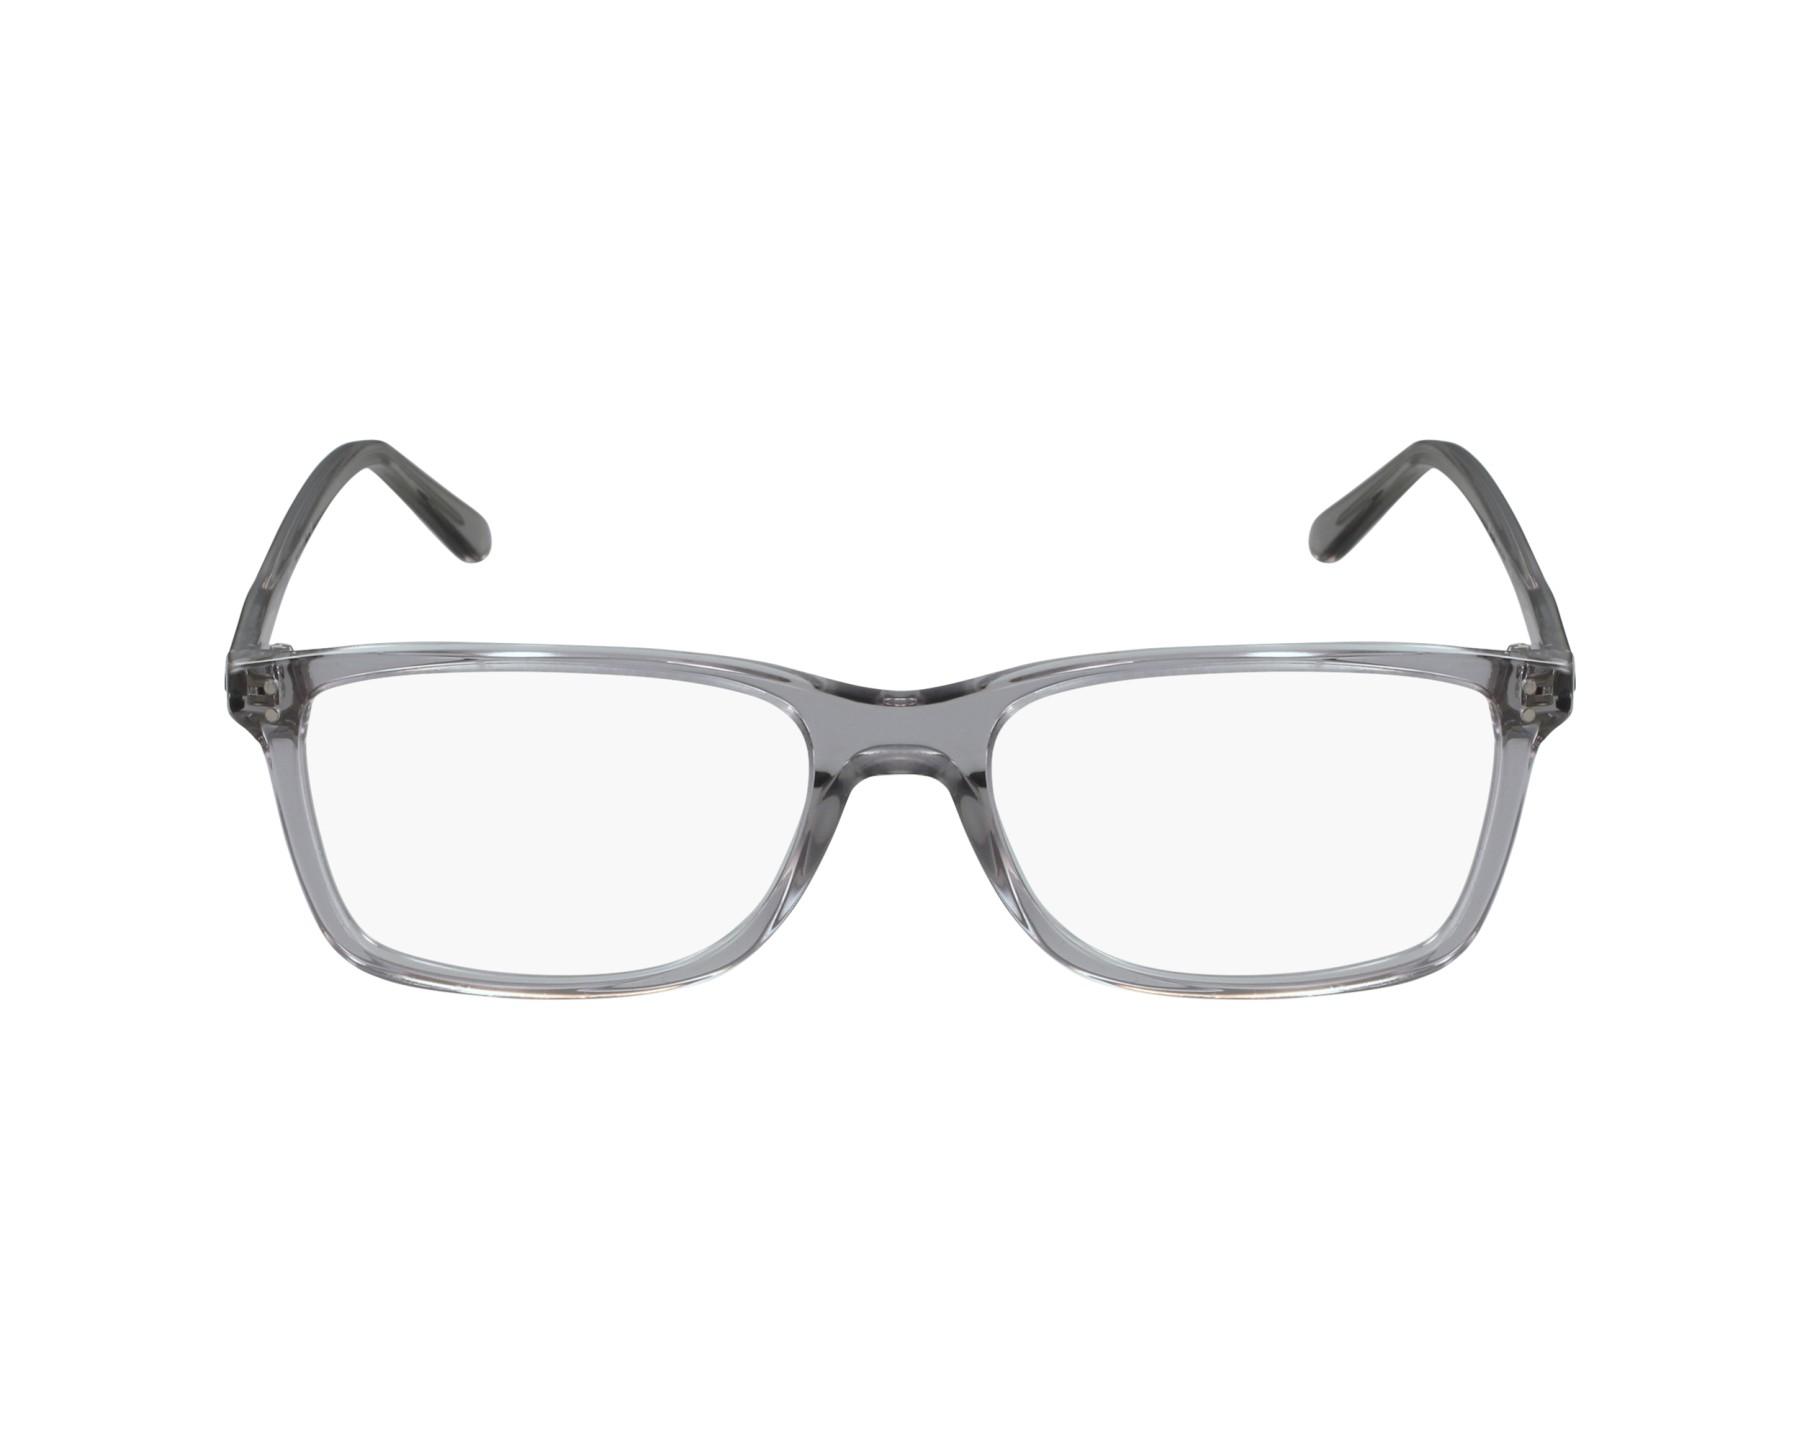 c8e6de534992 eyeglasses Ralph Lauren PH-2155 5413 - Grey profile view